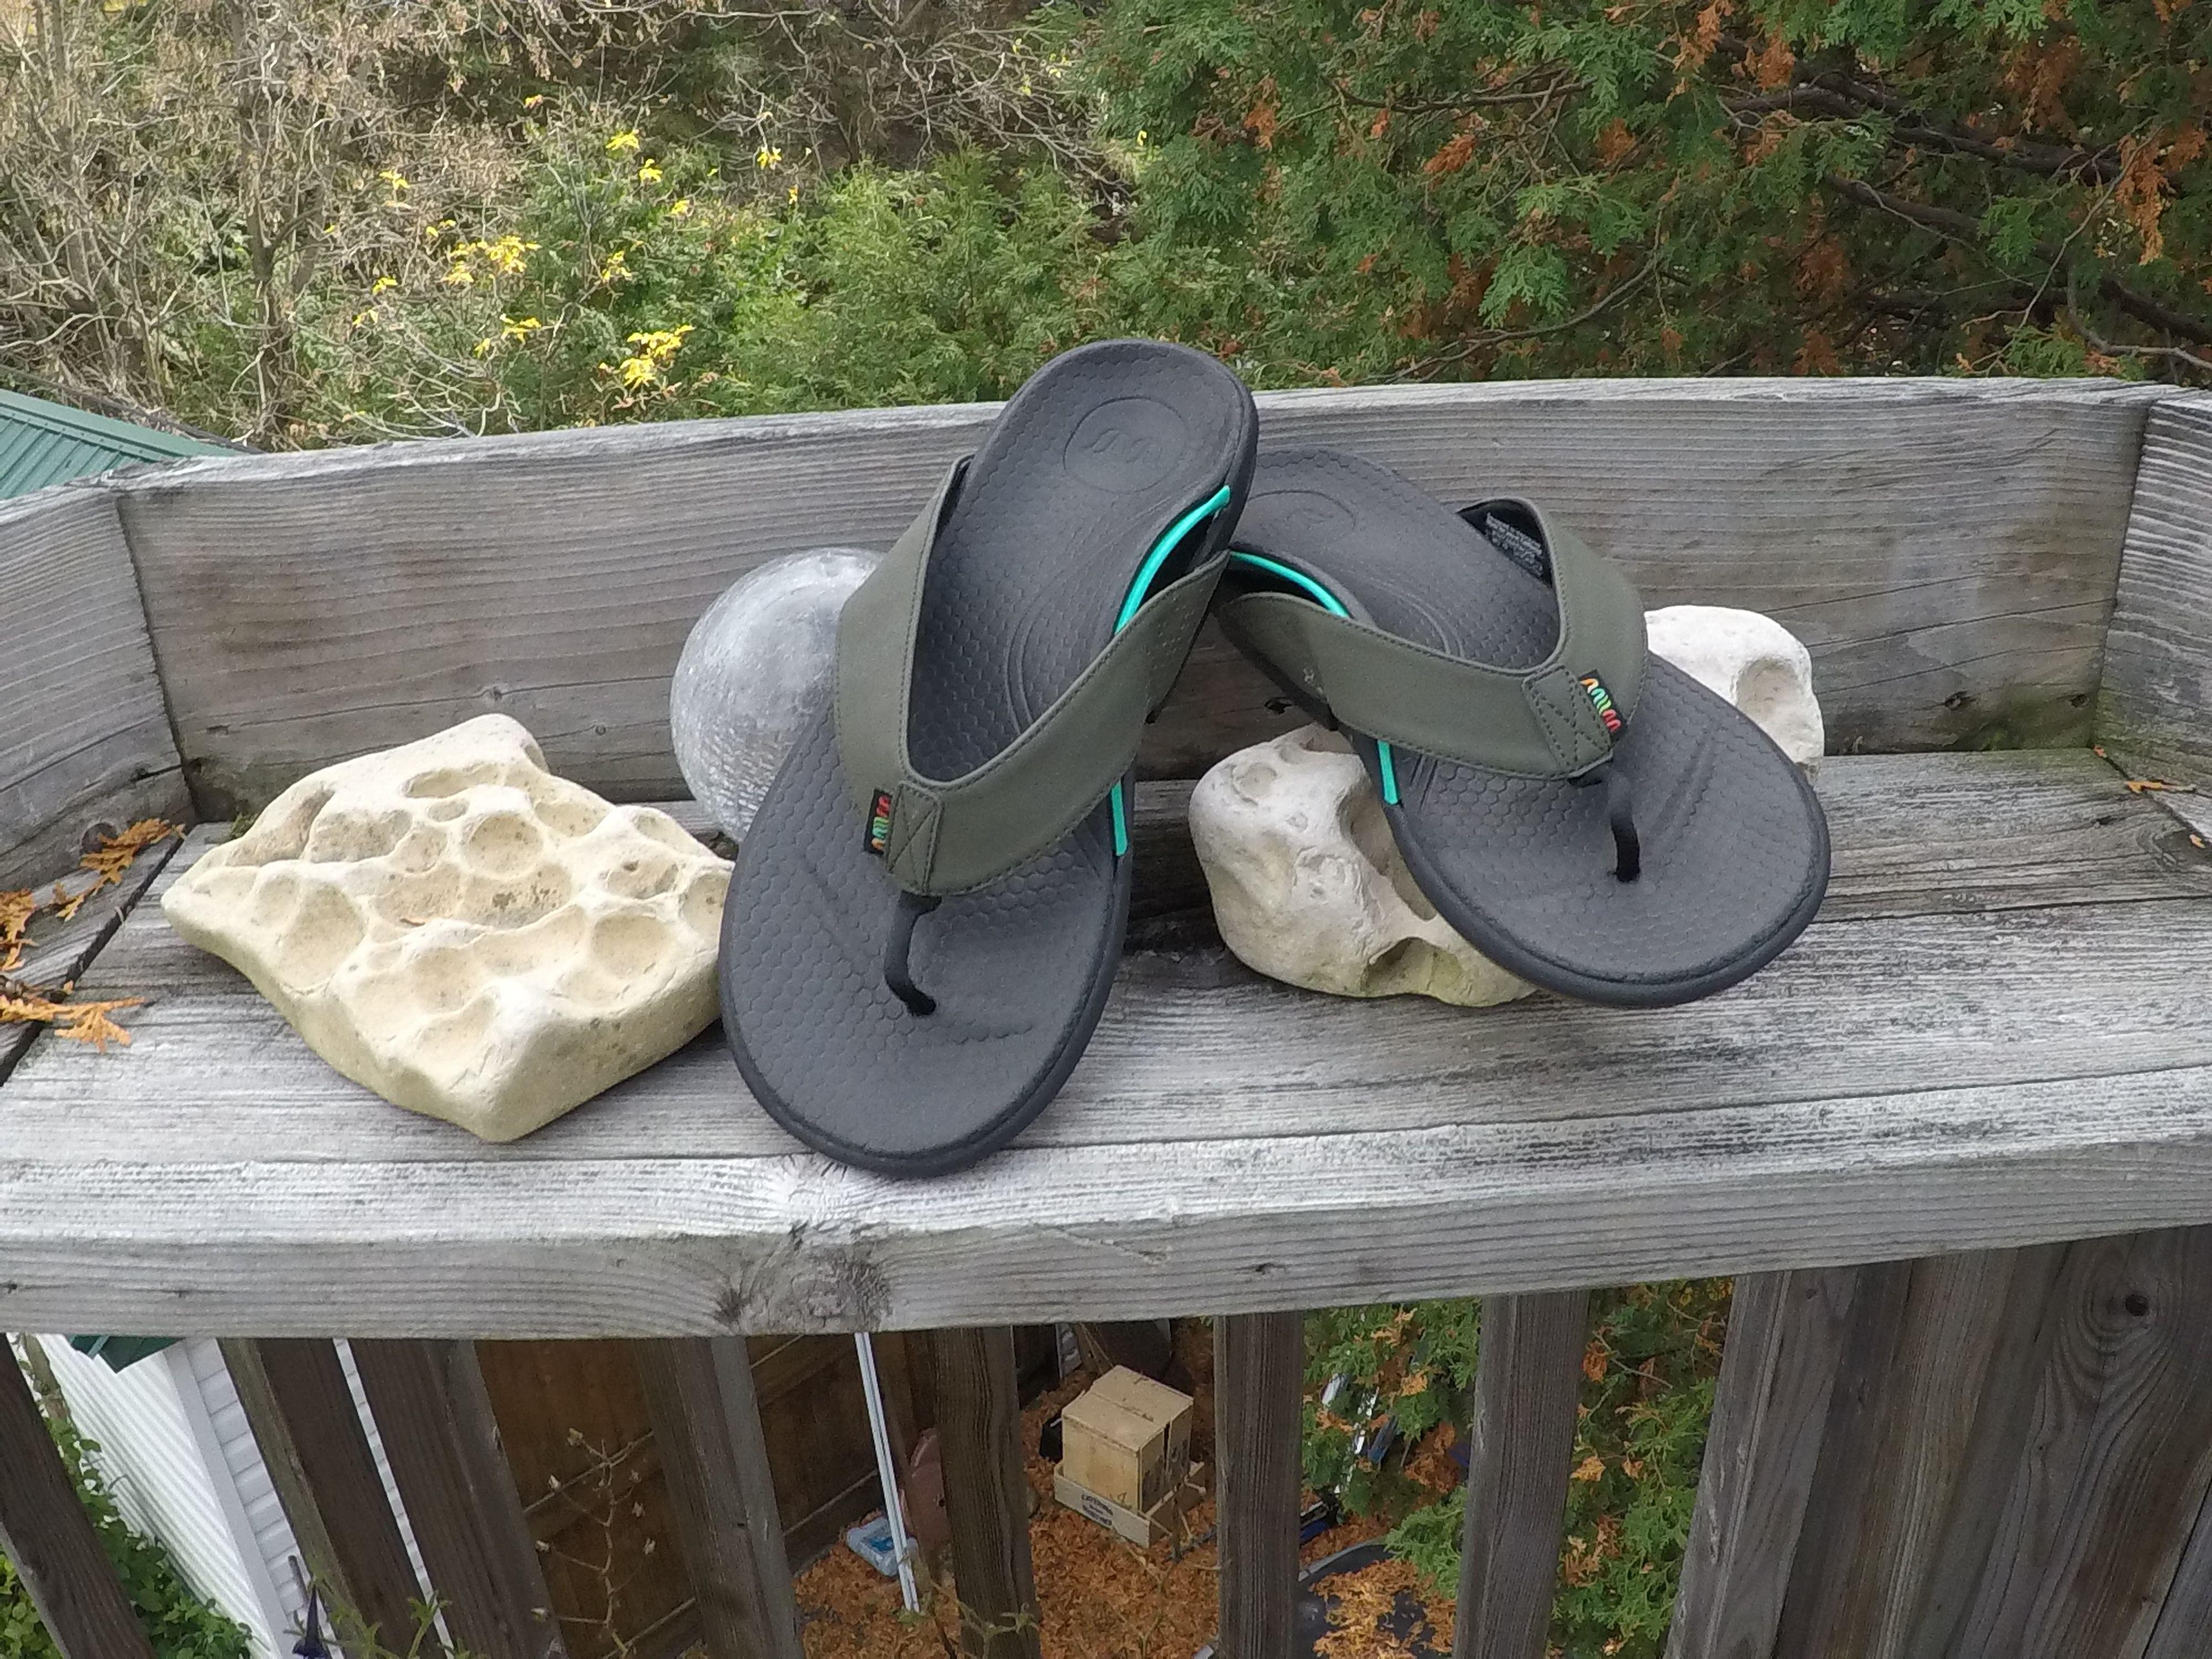 da3abcbd7667a8 Wiivv 3D Print Custom orthopedic Sandals. Wiivv custom Sandals can give  support for plantar fasciitis